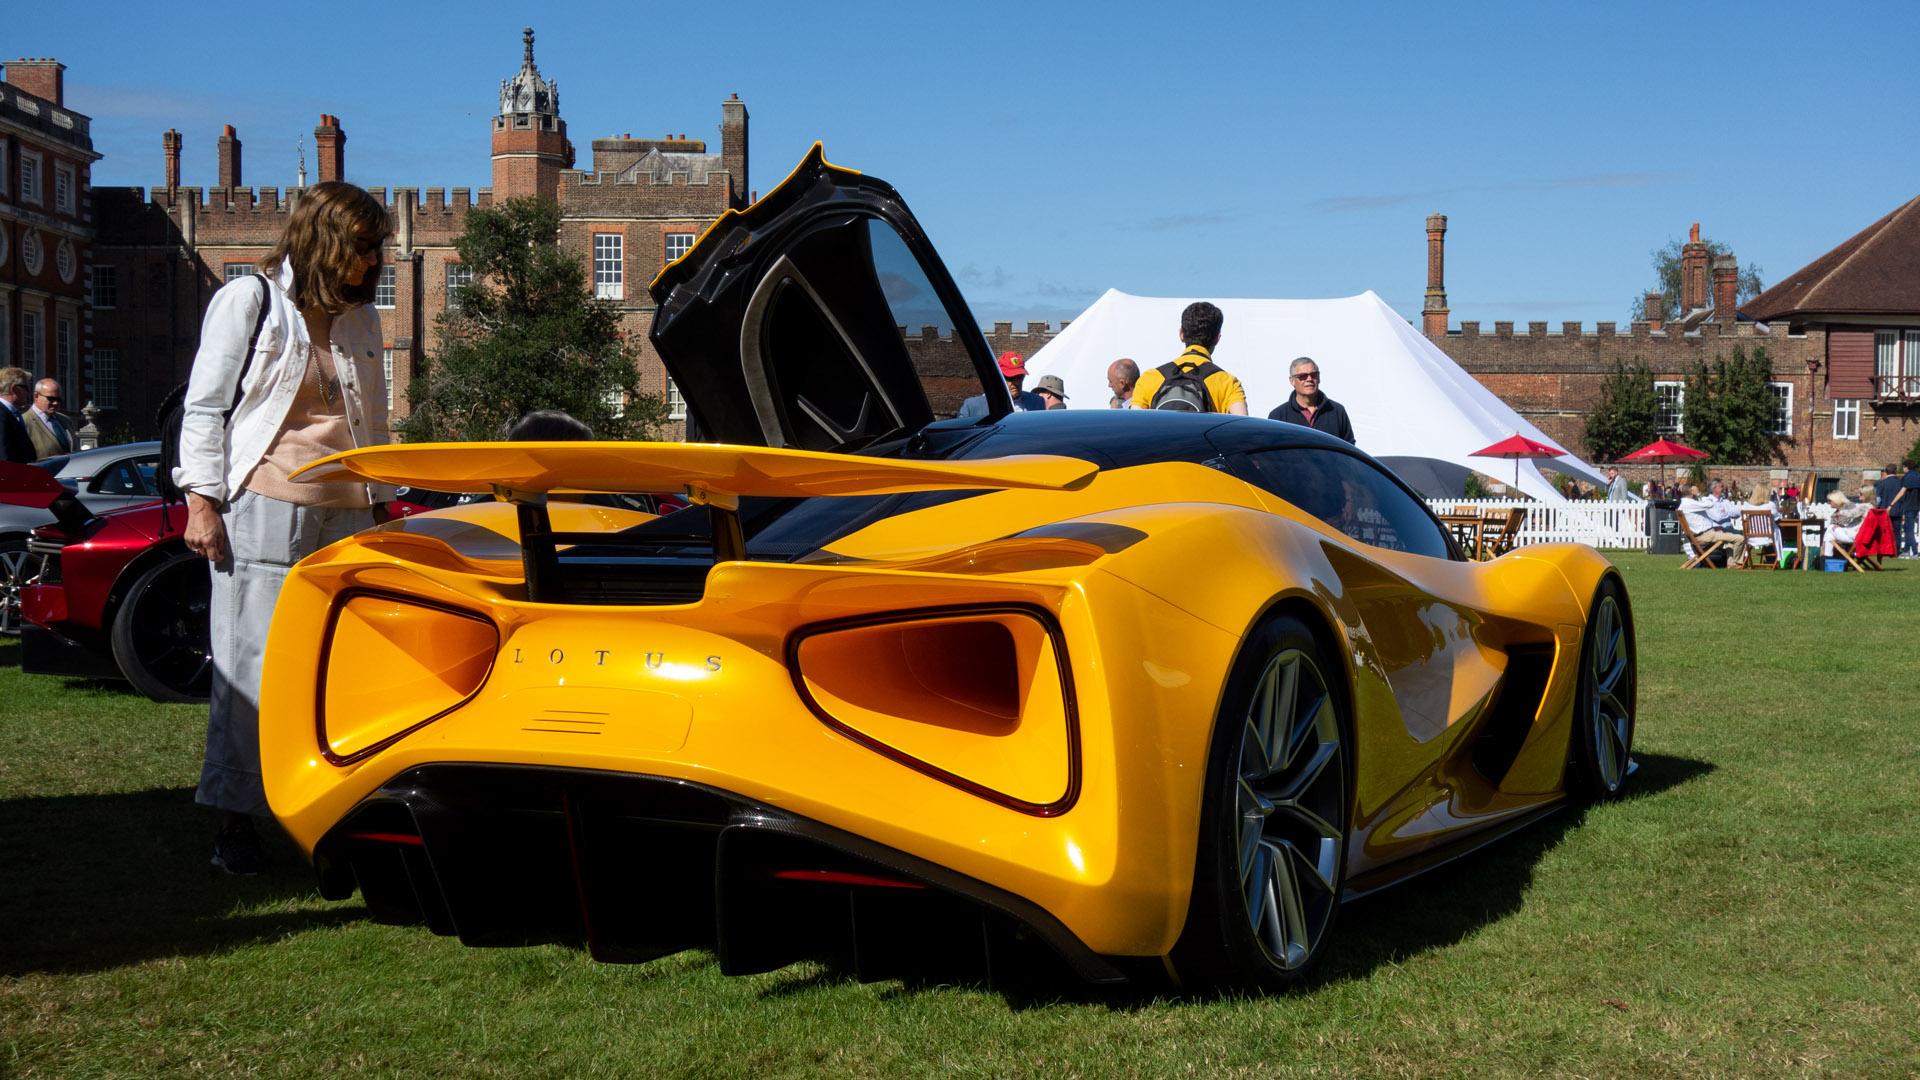 Lotus Evija rear design